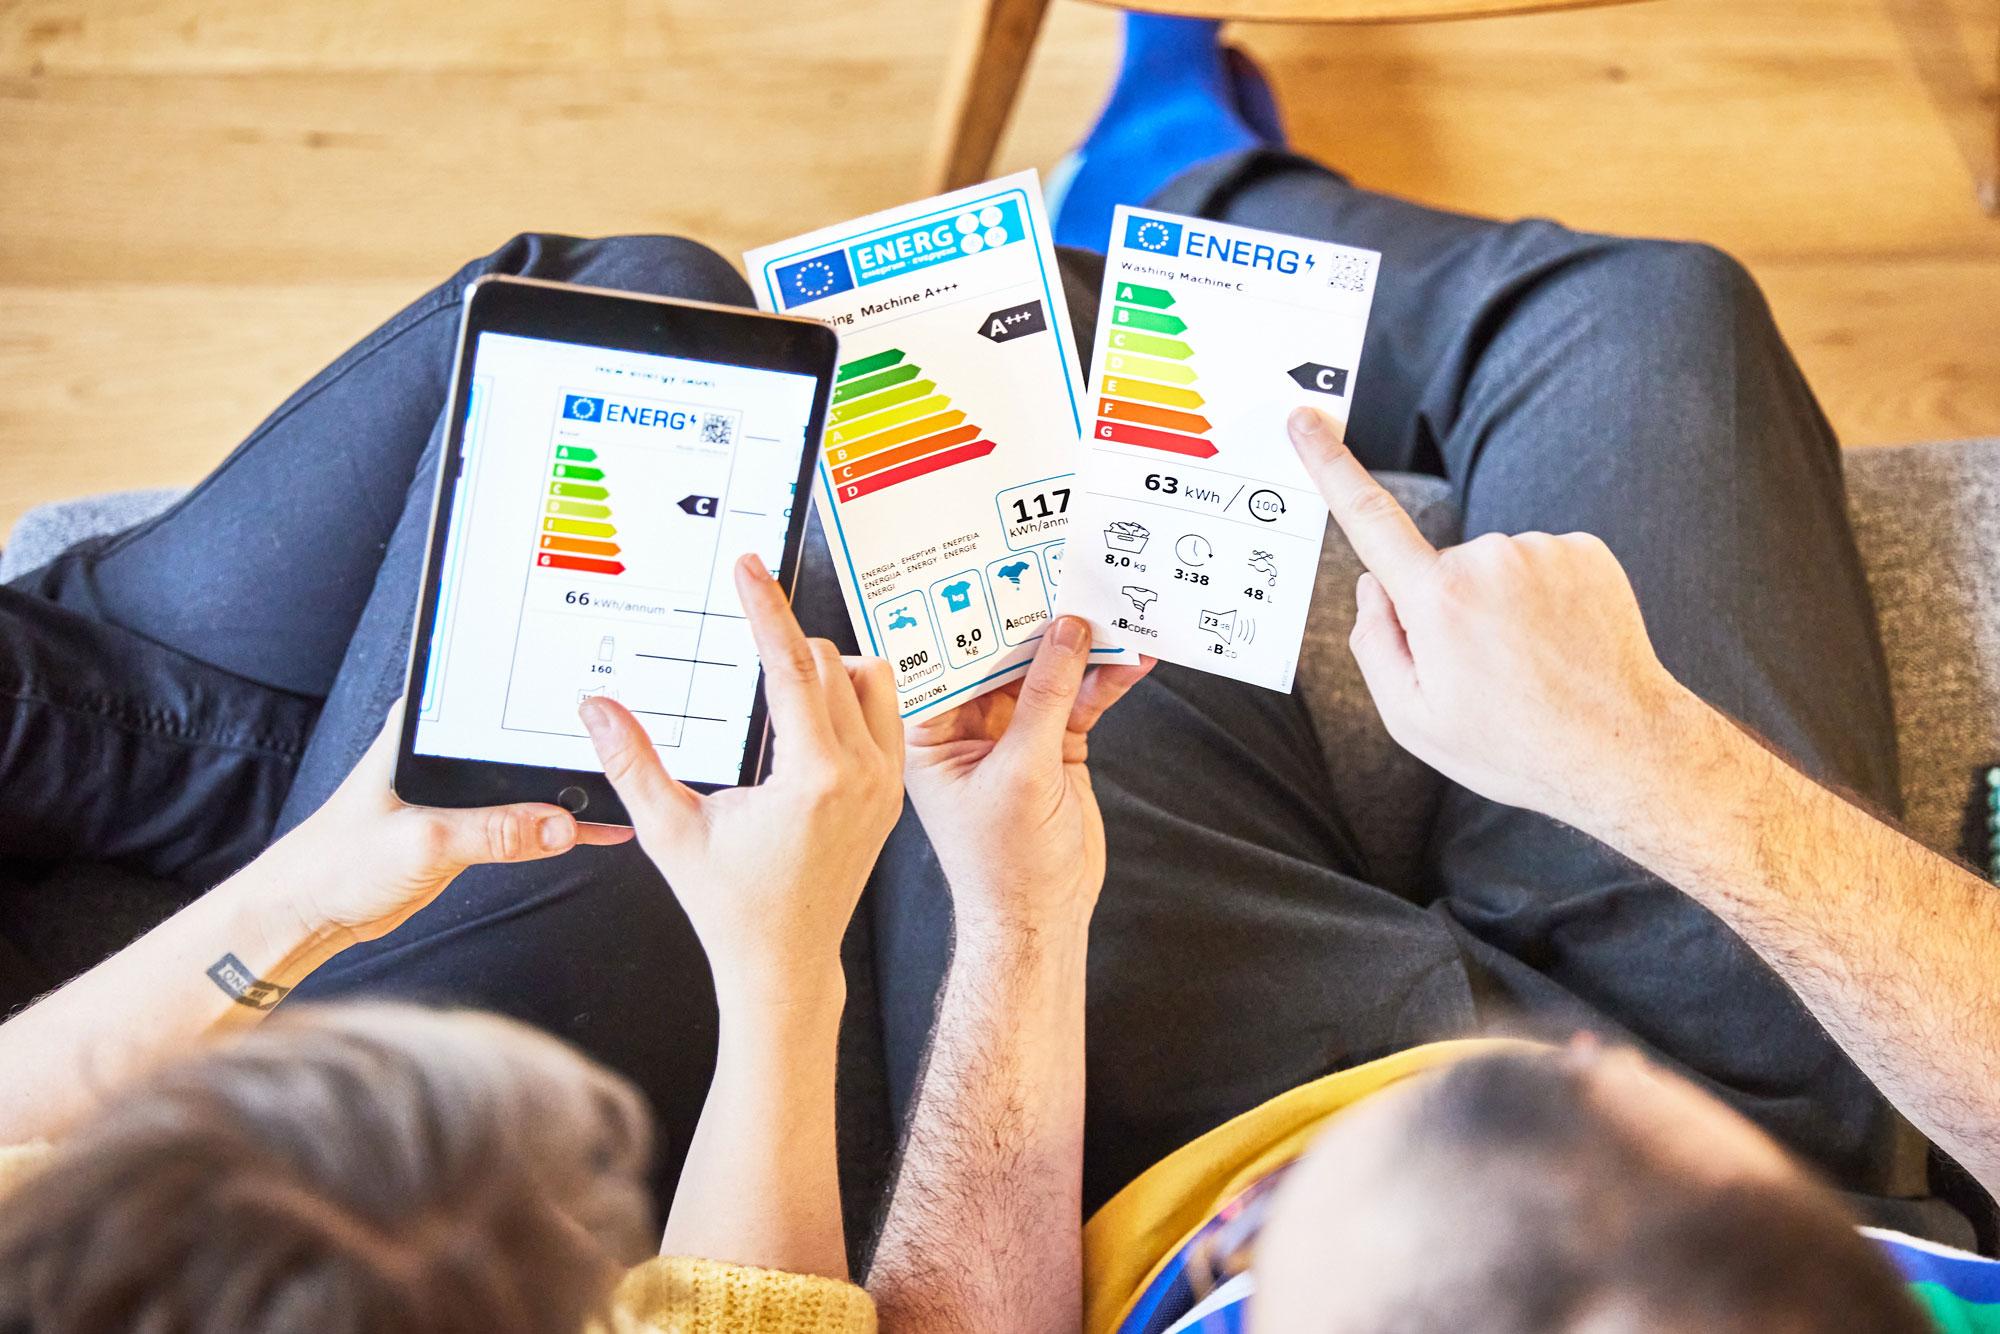 Energiamerkintä uudistuu, myös korjattavuudelle ja käyttöiälle tulee uusia vaatimuksia